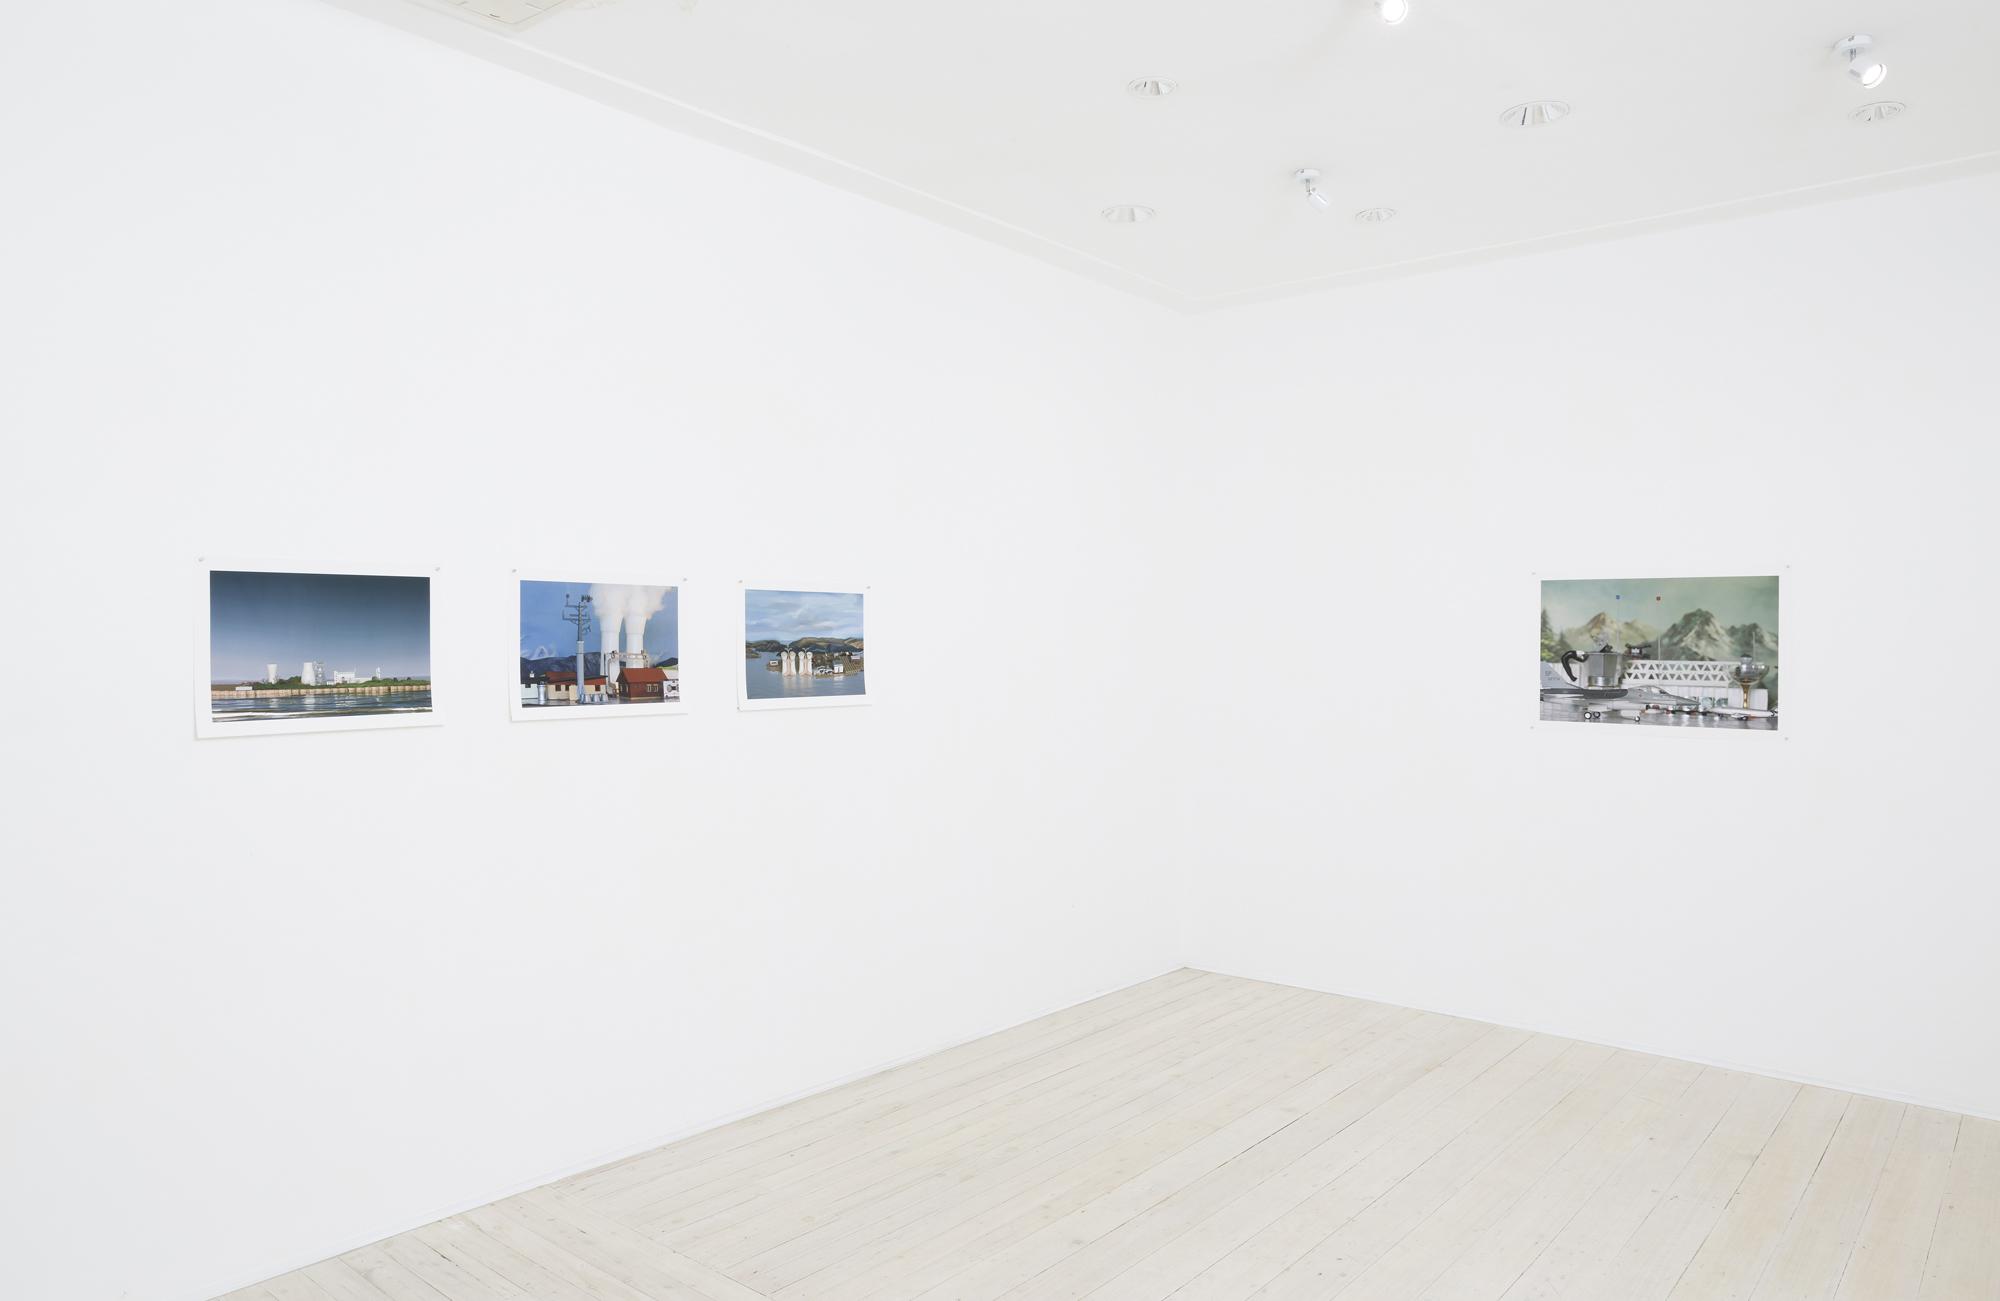 Elaine Campaner, exhibition view, Gallery 9